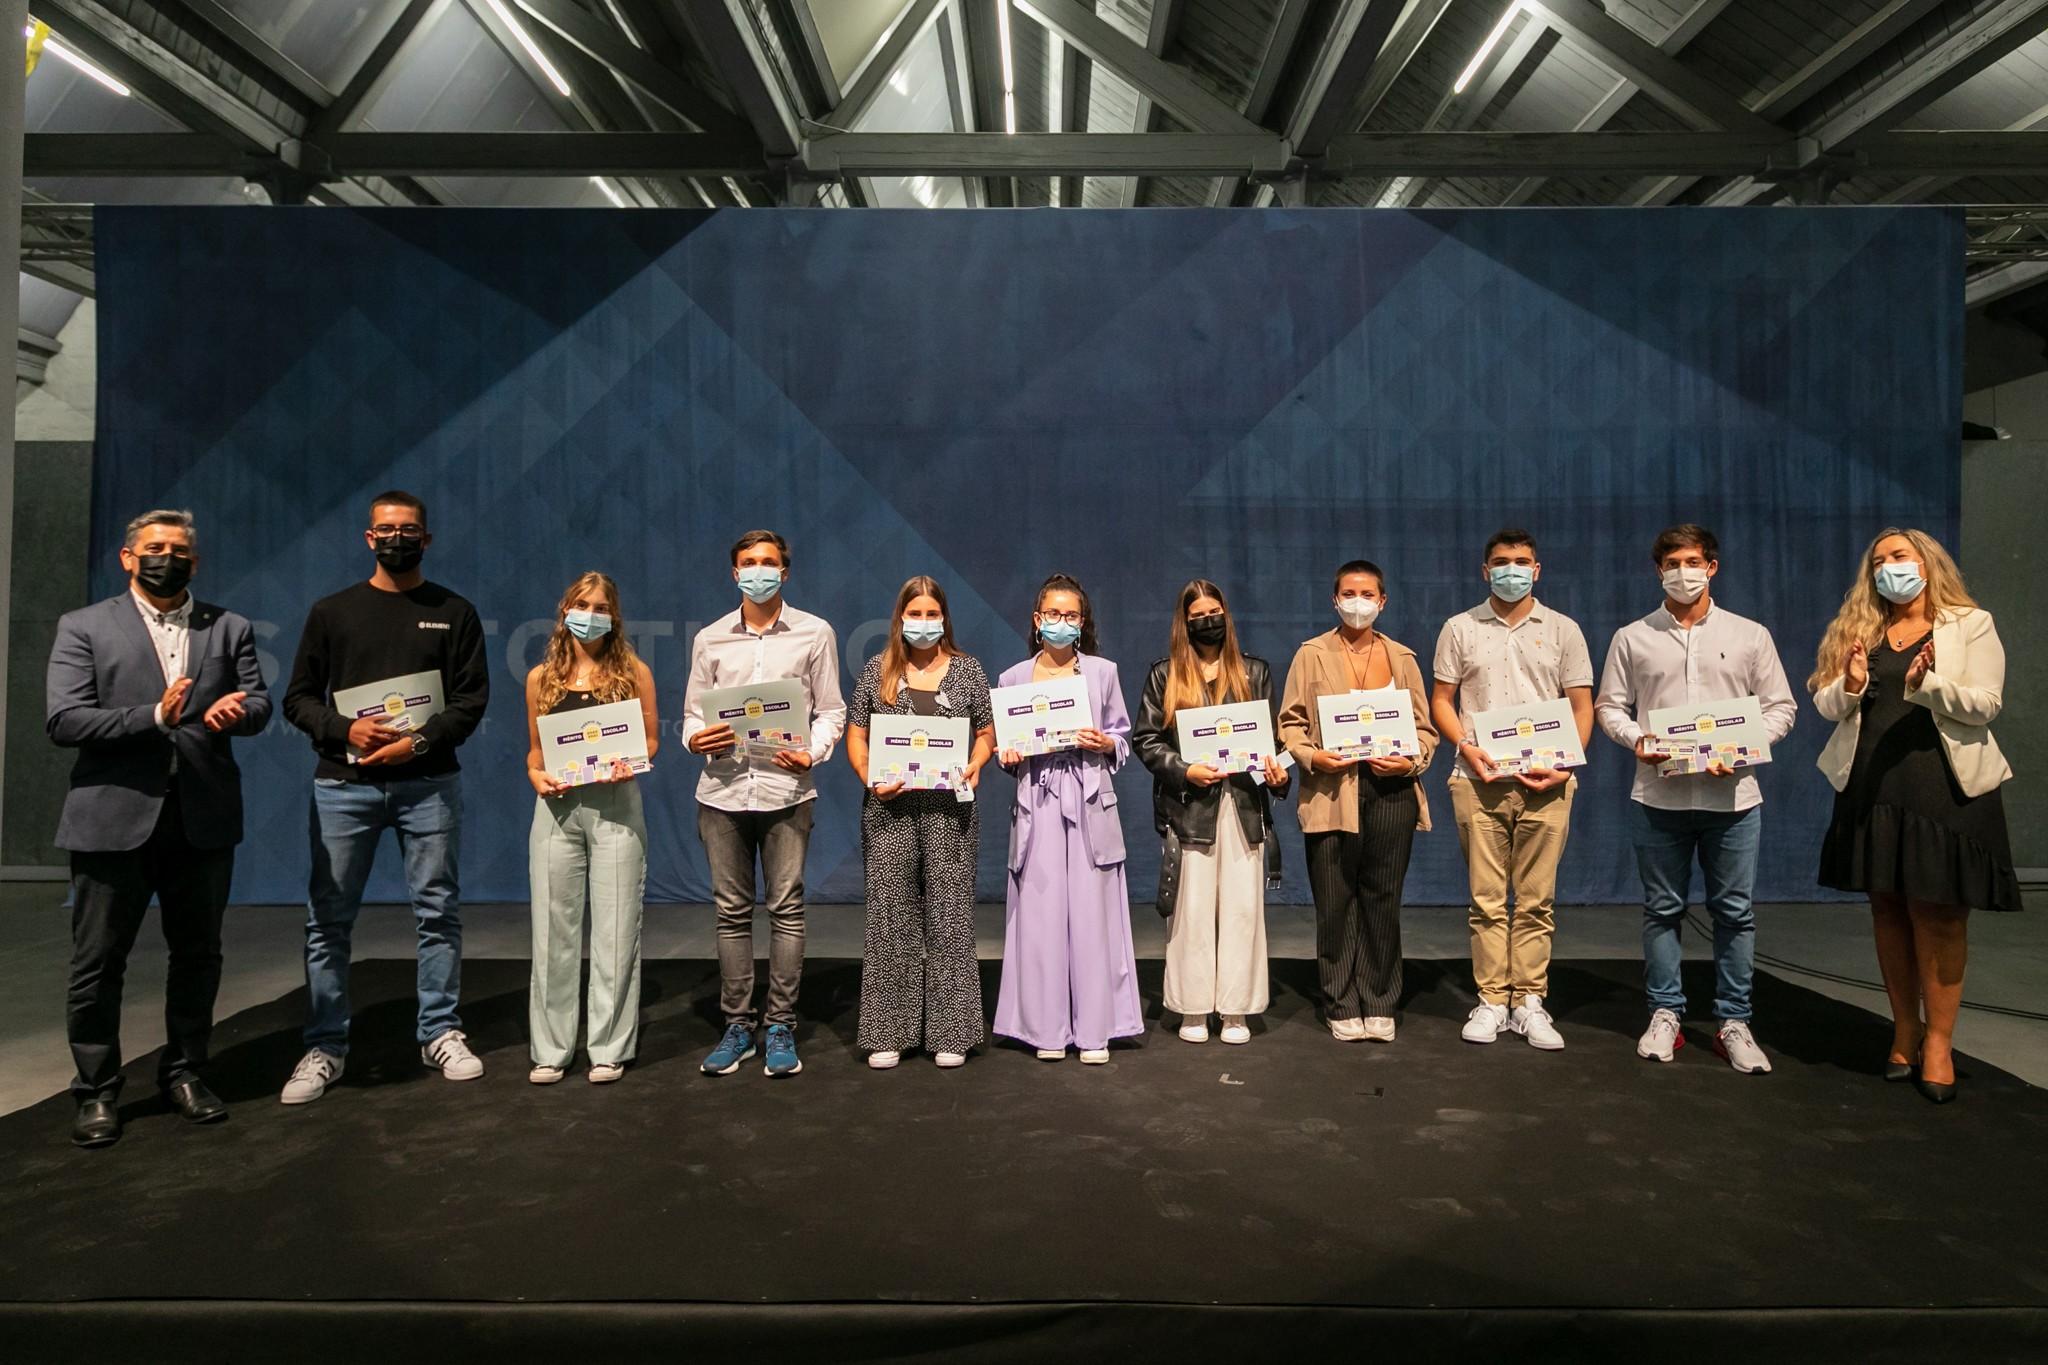 Alunos de Santo Tirso receberam prémios de mérito escolar